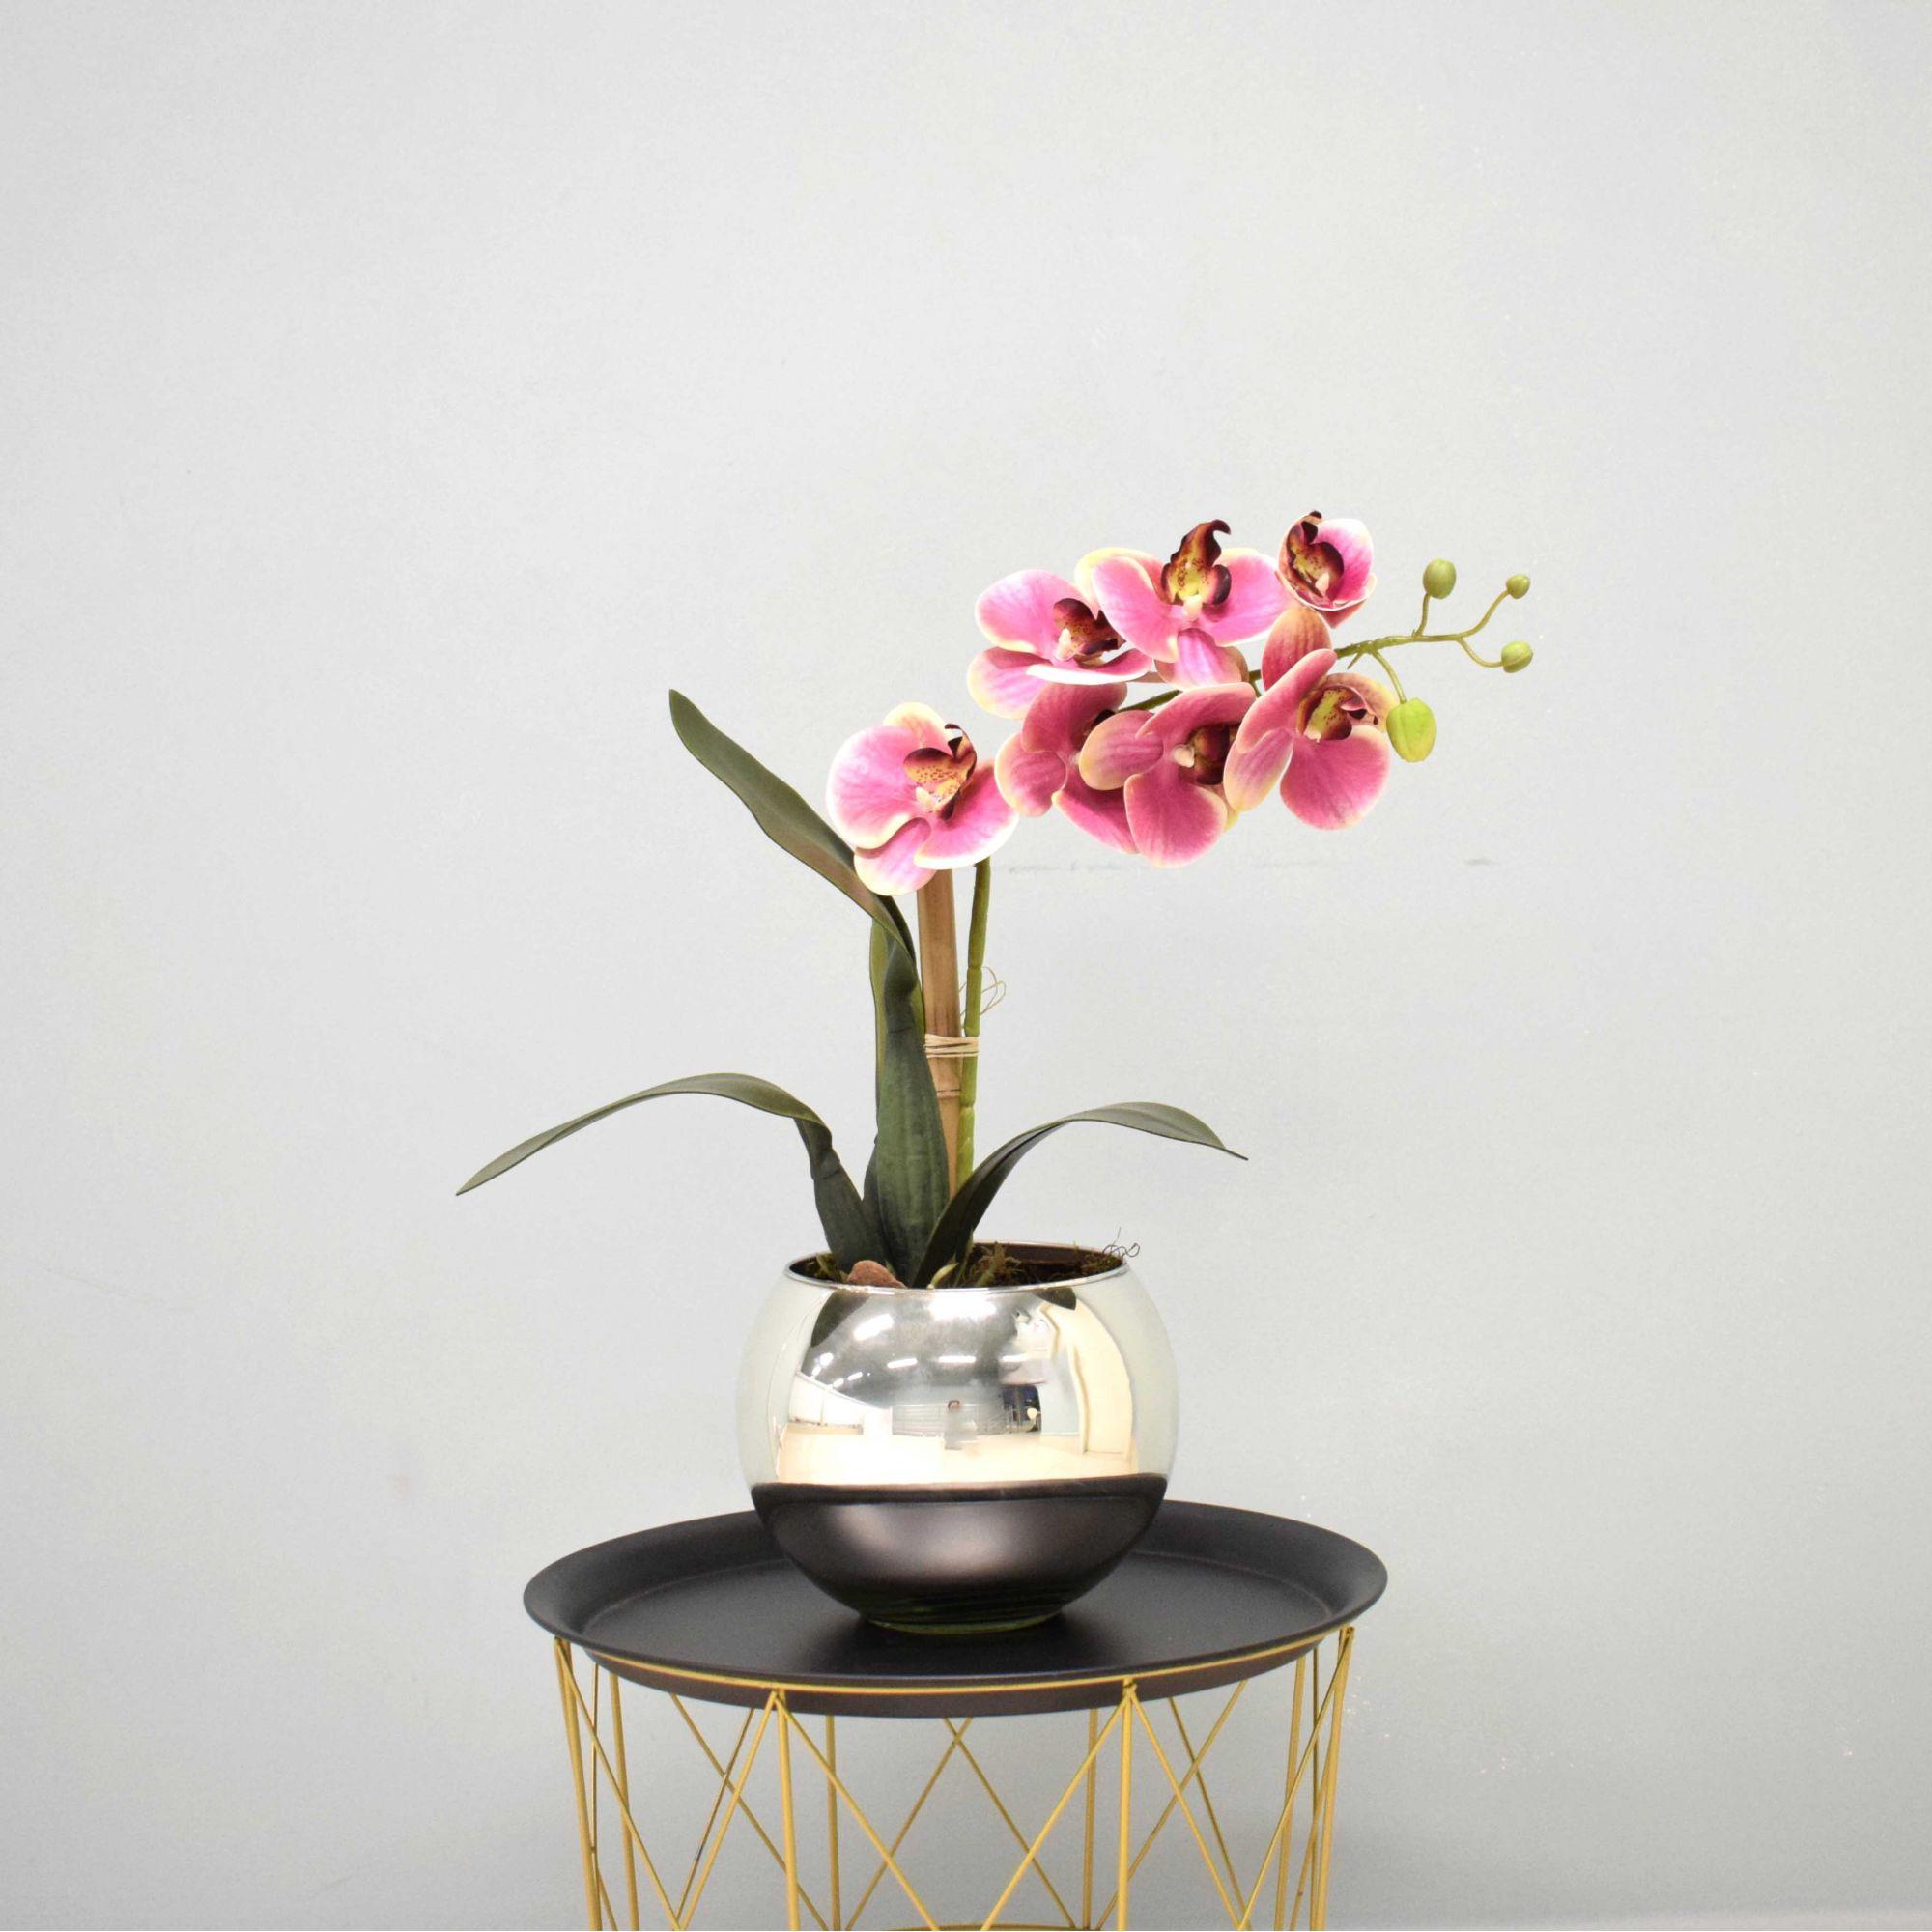 Arranjo de Orquídea Rosa Artificial no Vaso Espelhado |Linha Permanente Formosinha